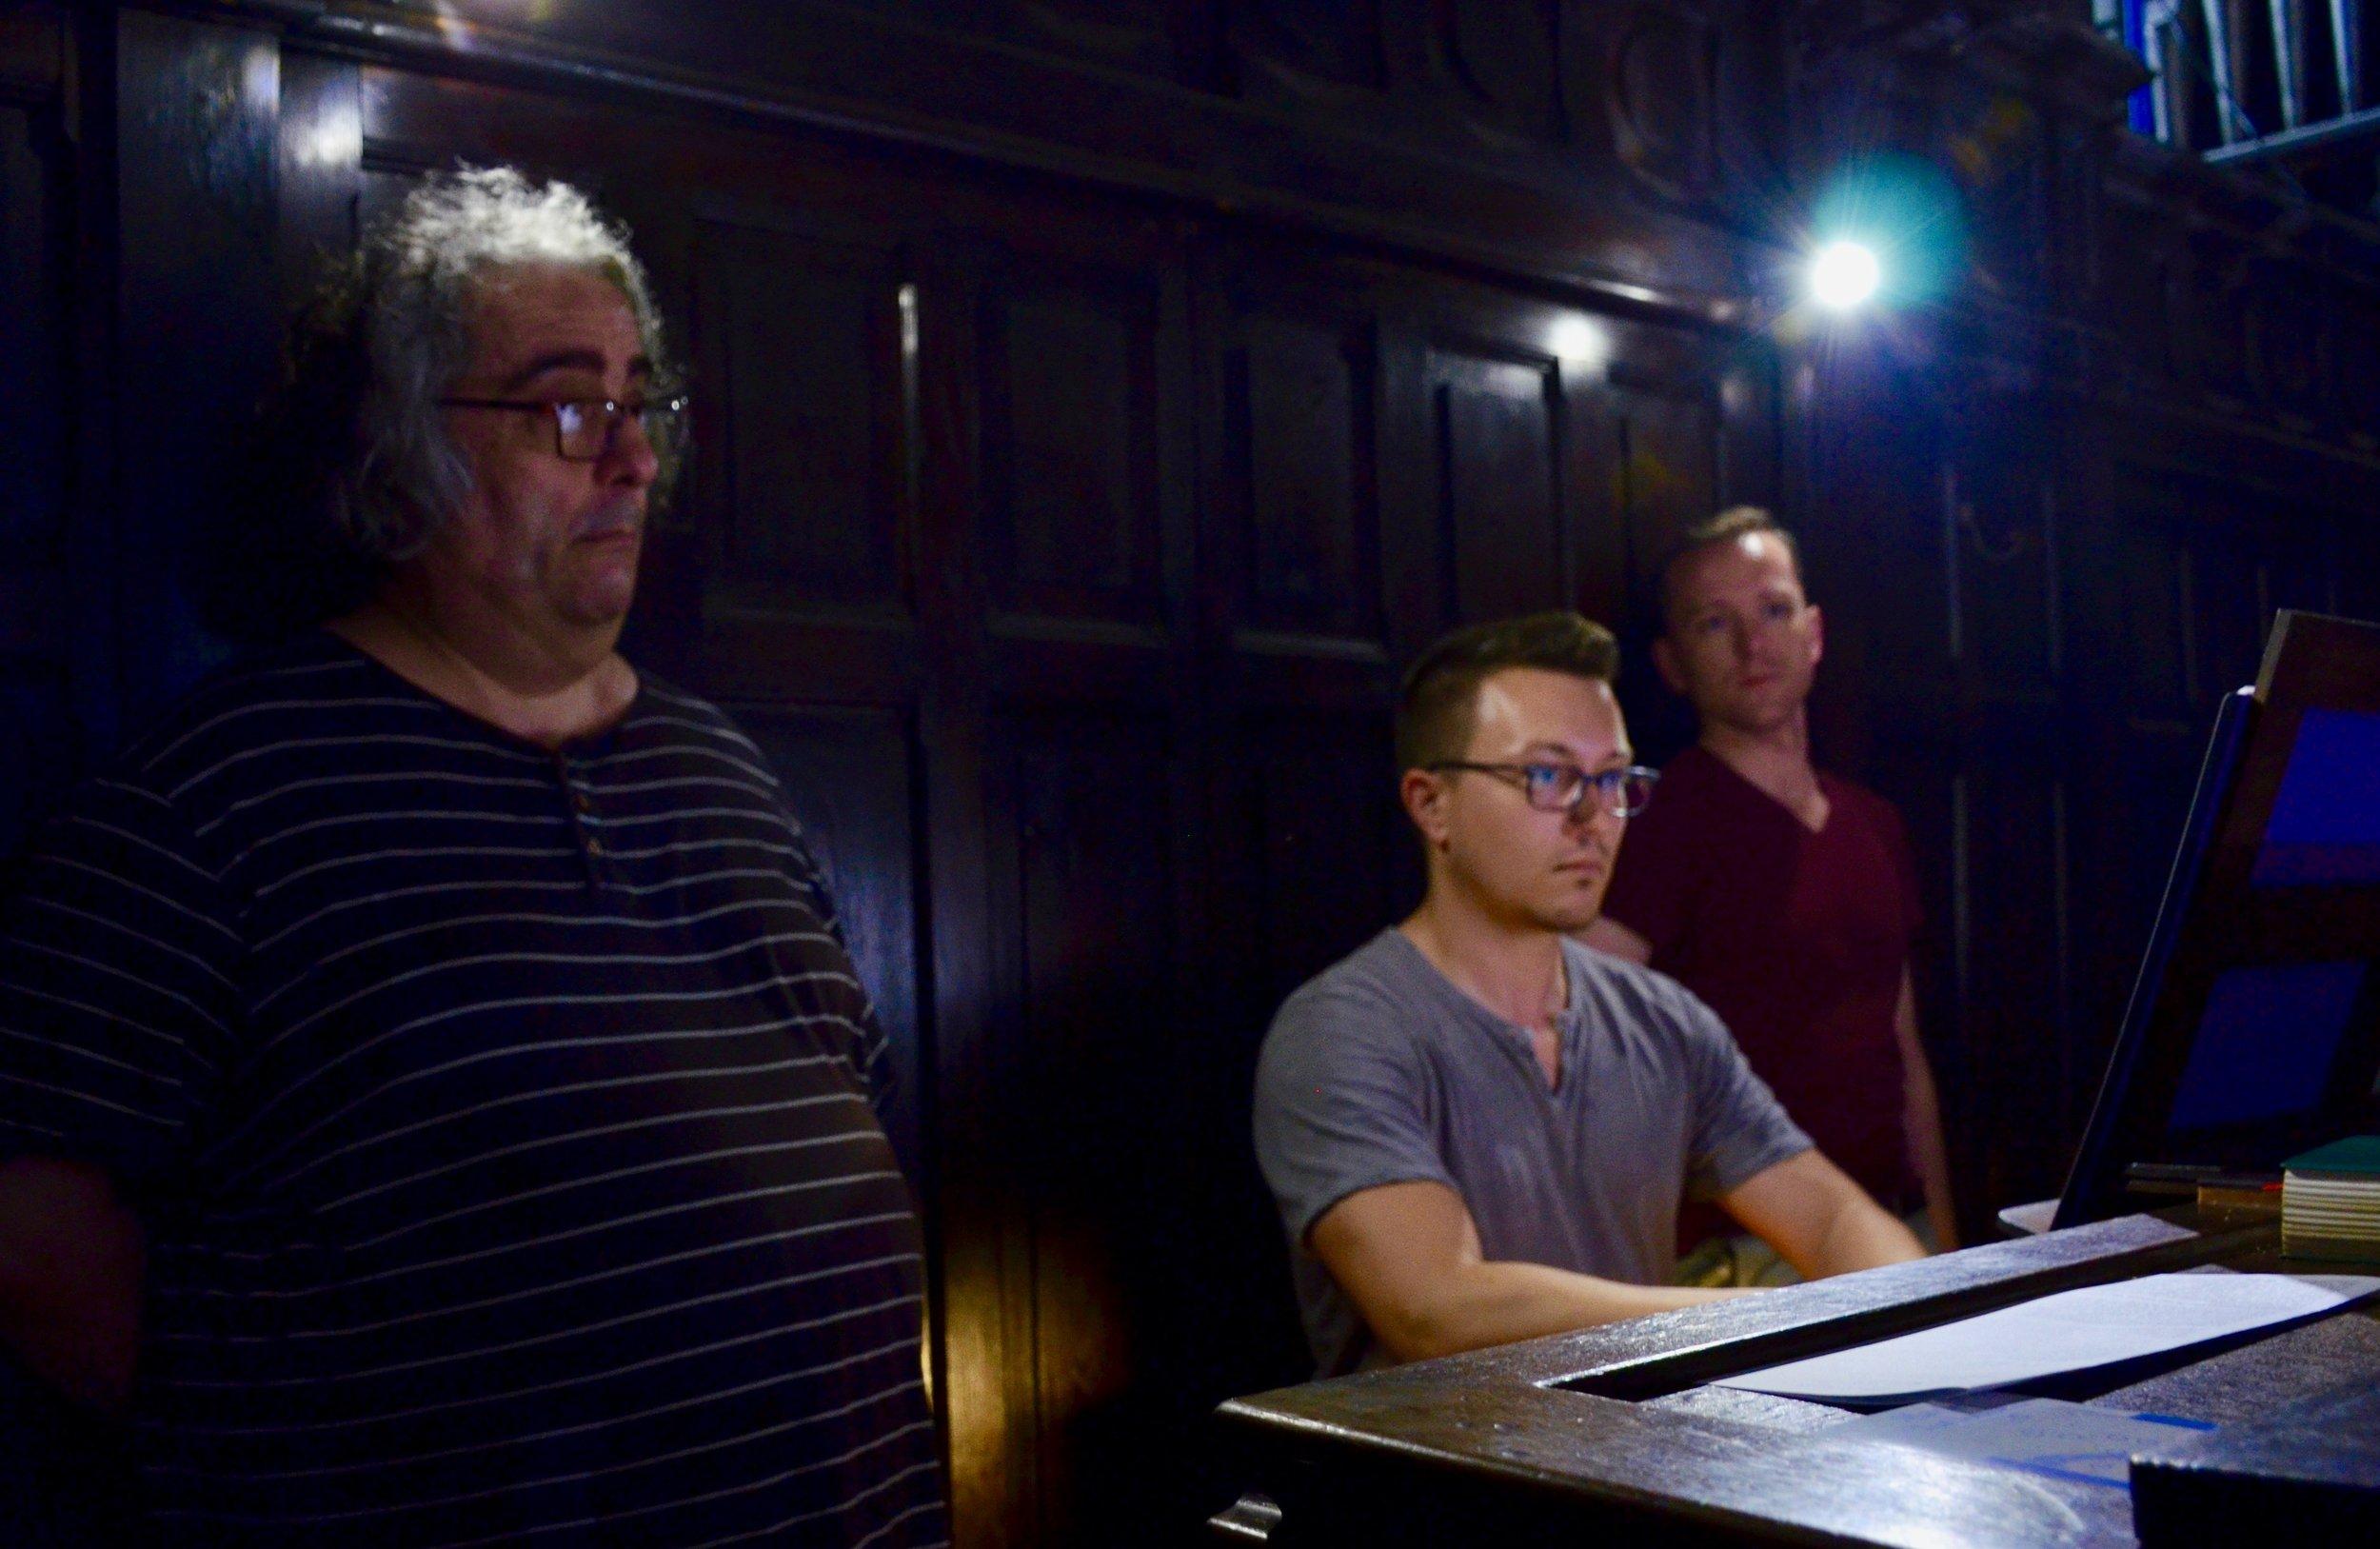 Corey De Tar plays the organ of Notre Dame du Taur, with Jean-Claude Guidarini and Christian Lane looking on.